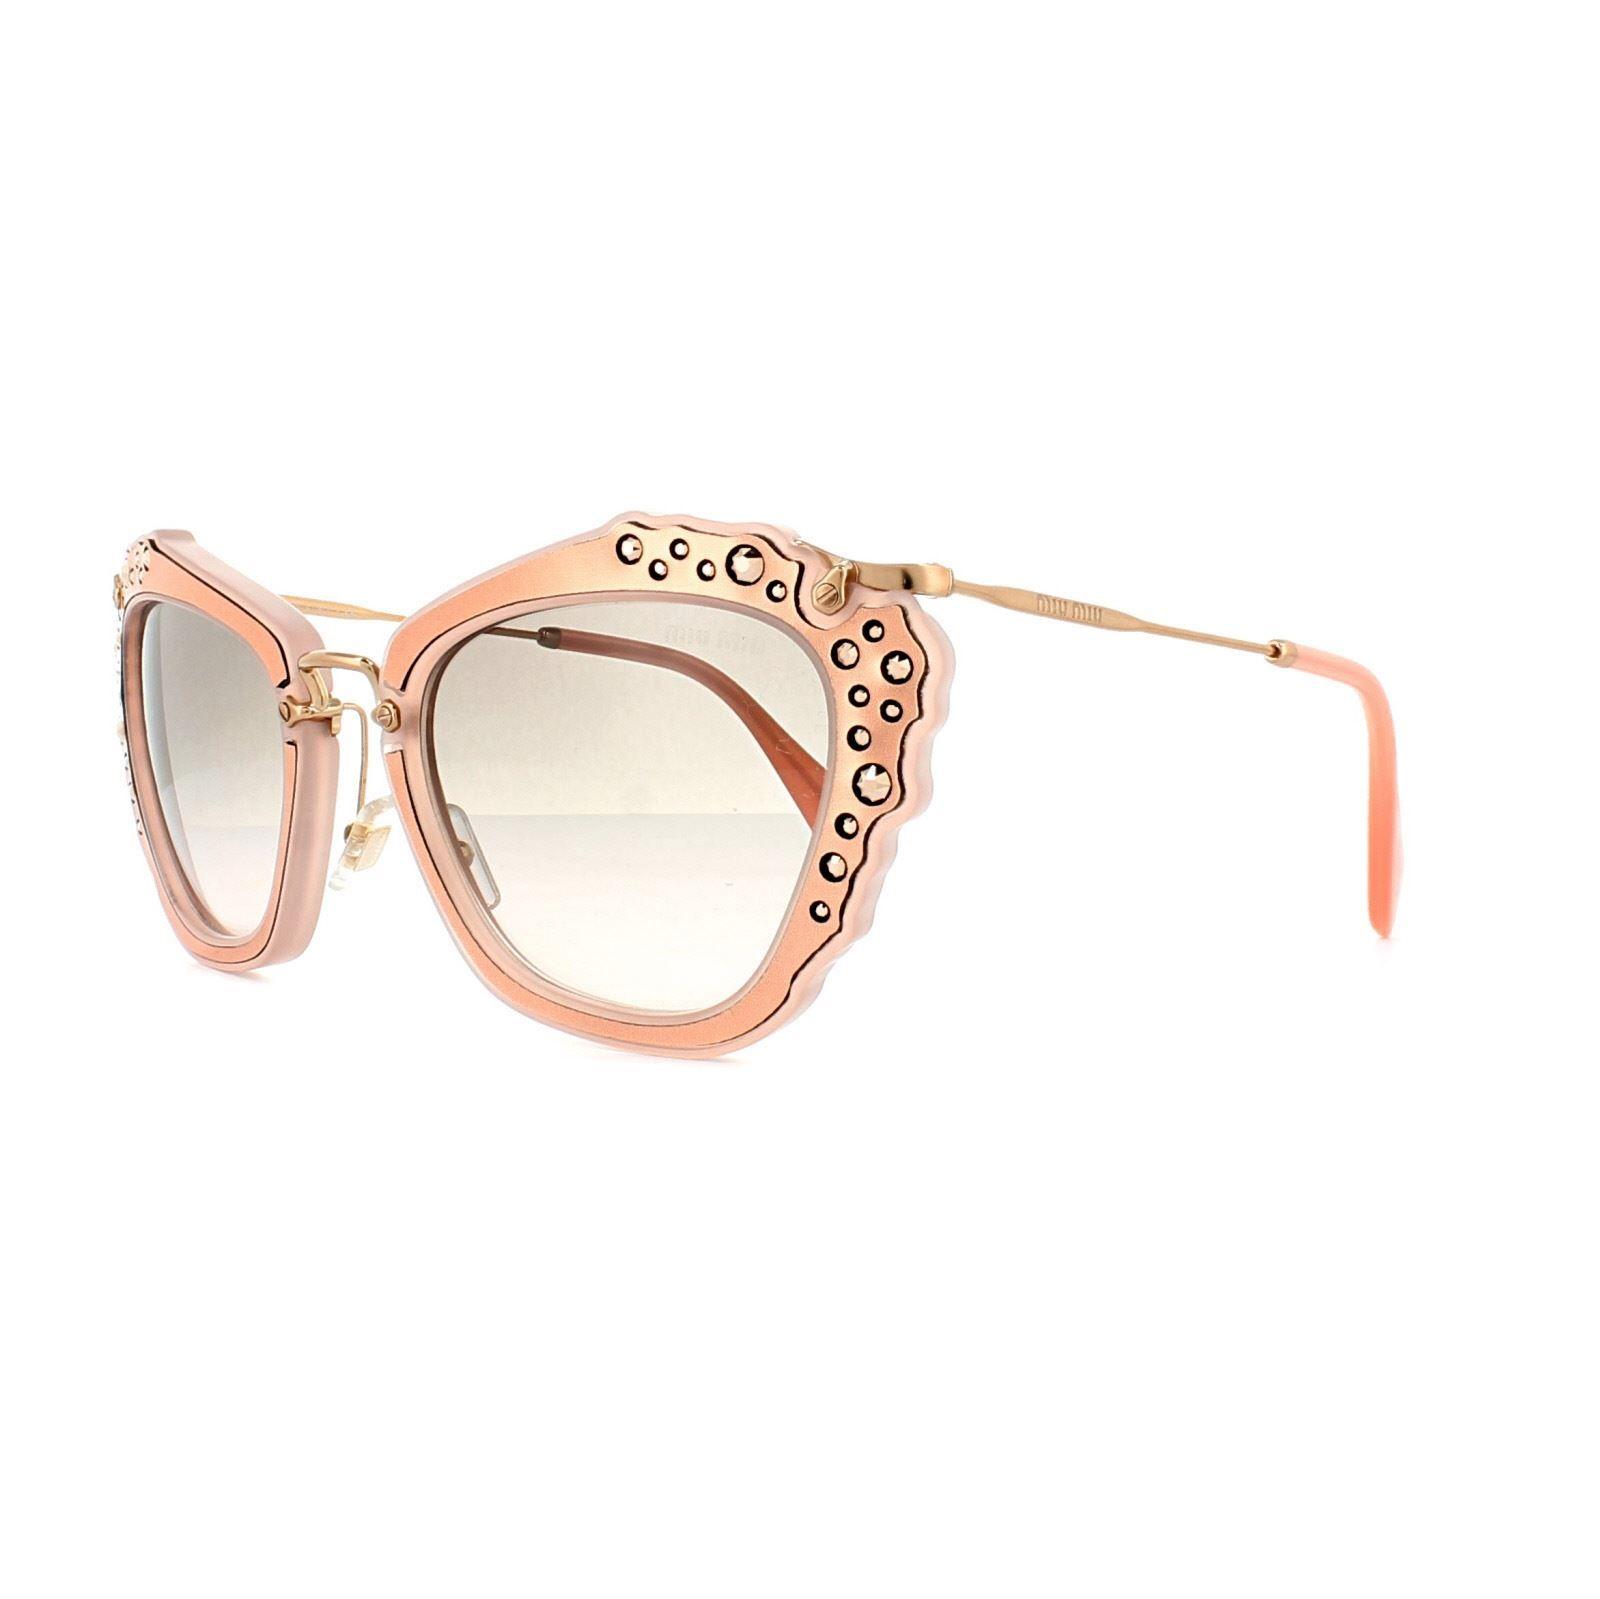 Miu Miu Sunglasses 04QS TV14K0 Matt Pink Grey Pink Gradient